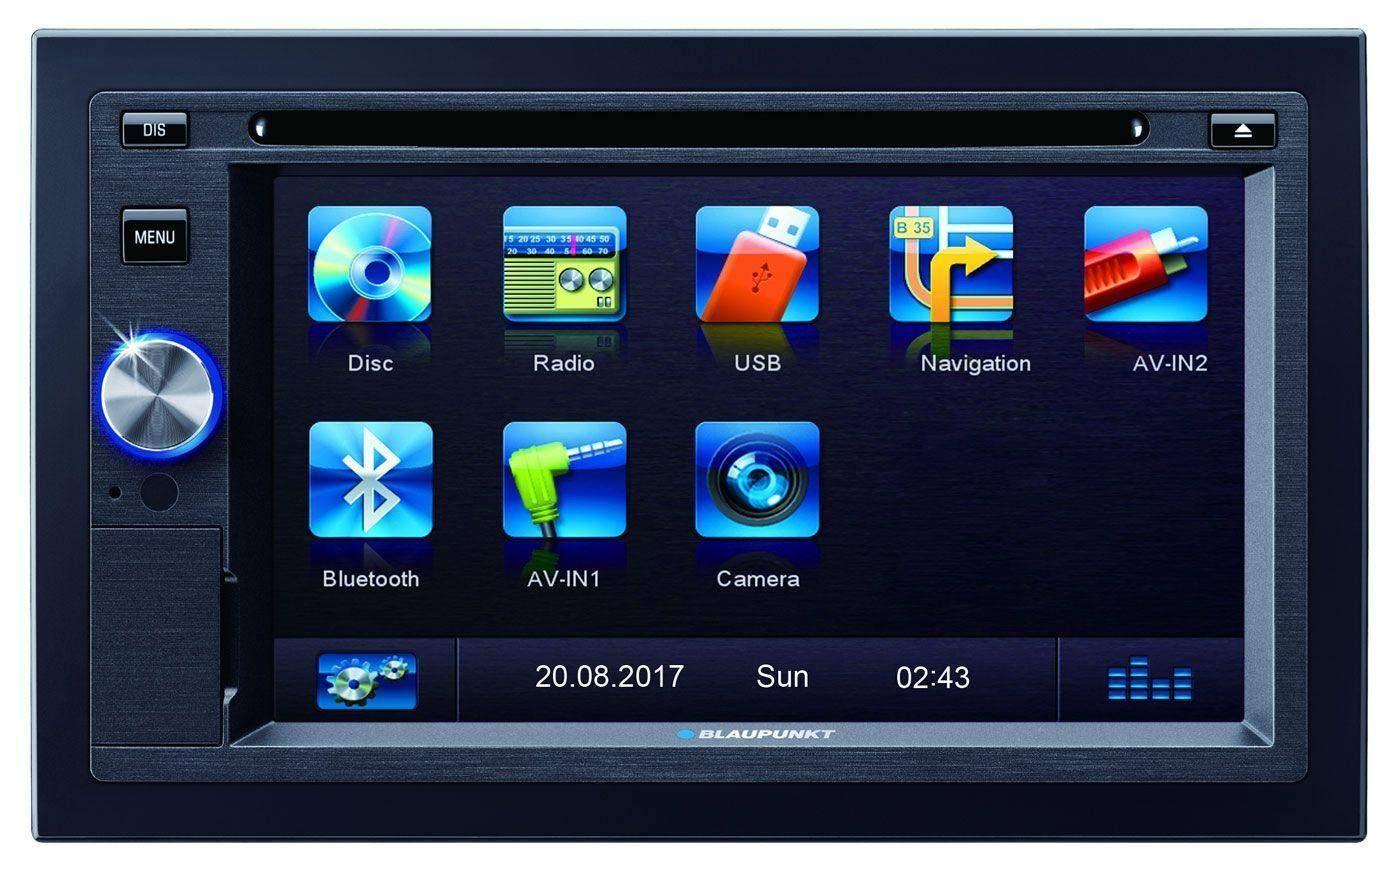 Blaupunkt-Las-Vegas-570-Autoradio-2DIN-Bluetooth-Freisprechen-Audio-DVD-CD-USB-SD-AUX-10-Band-EQ-Anschluss-Lenkradfernbedienung-IR-Fernbedienung-4x-45W